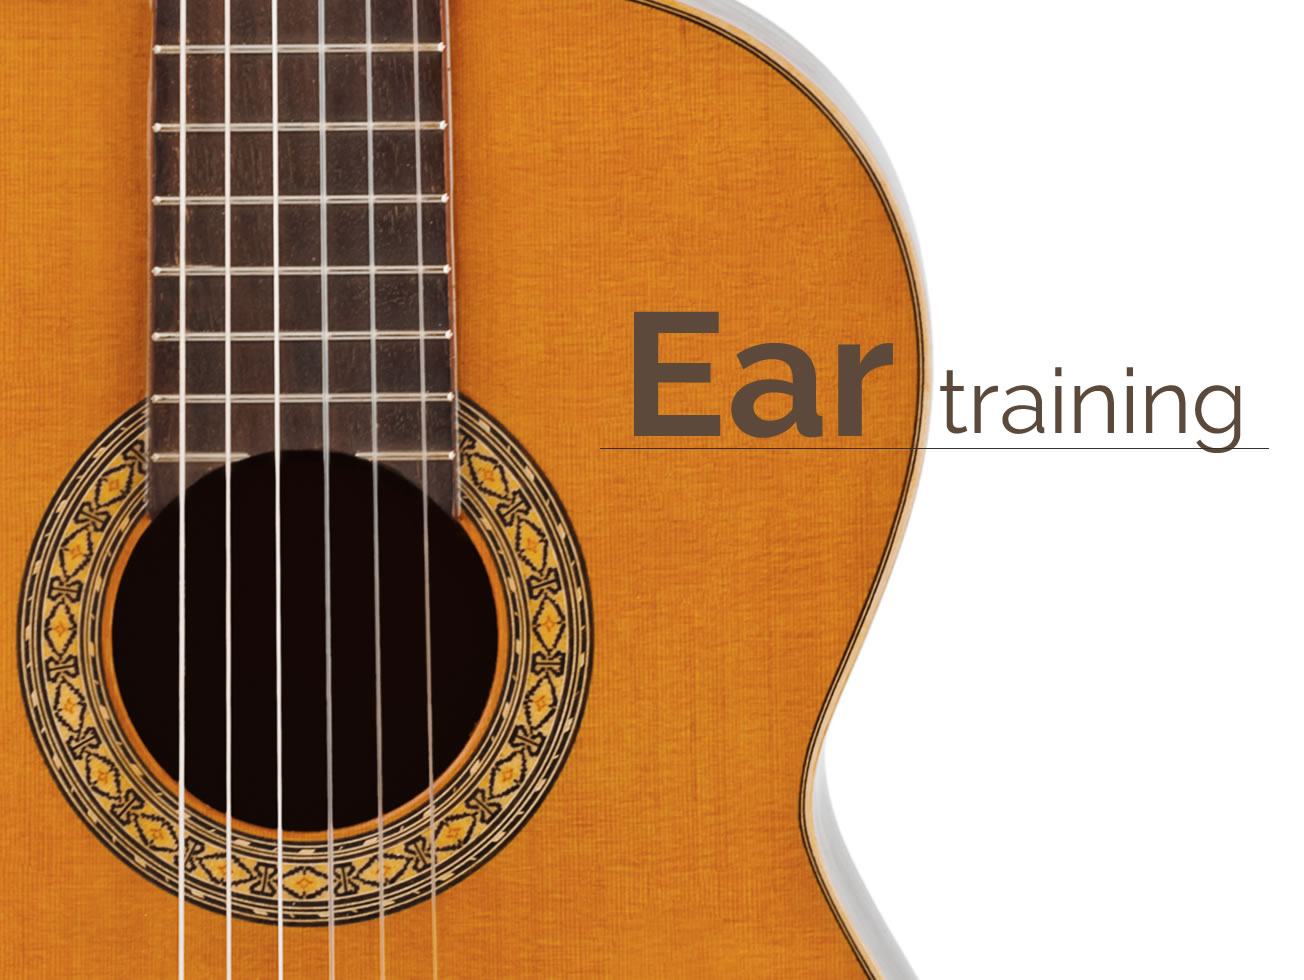 free lessons guitar lesson world rh guitarlessonworld com Anatomy of Speech Production Anime Anatomy Lessons